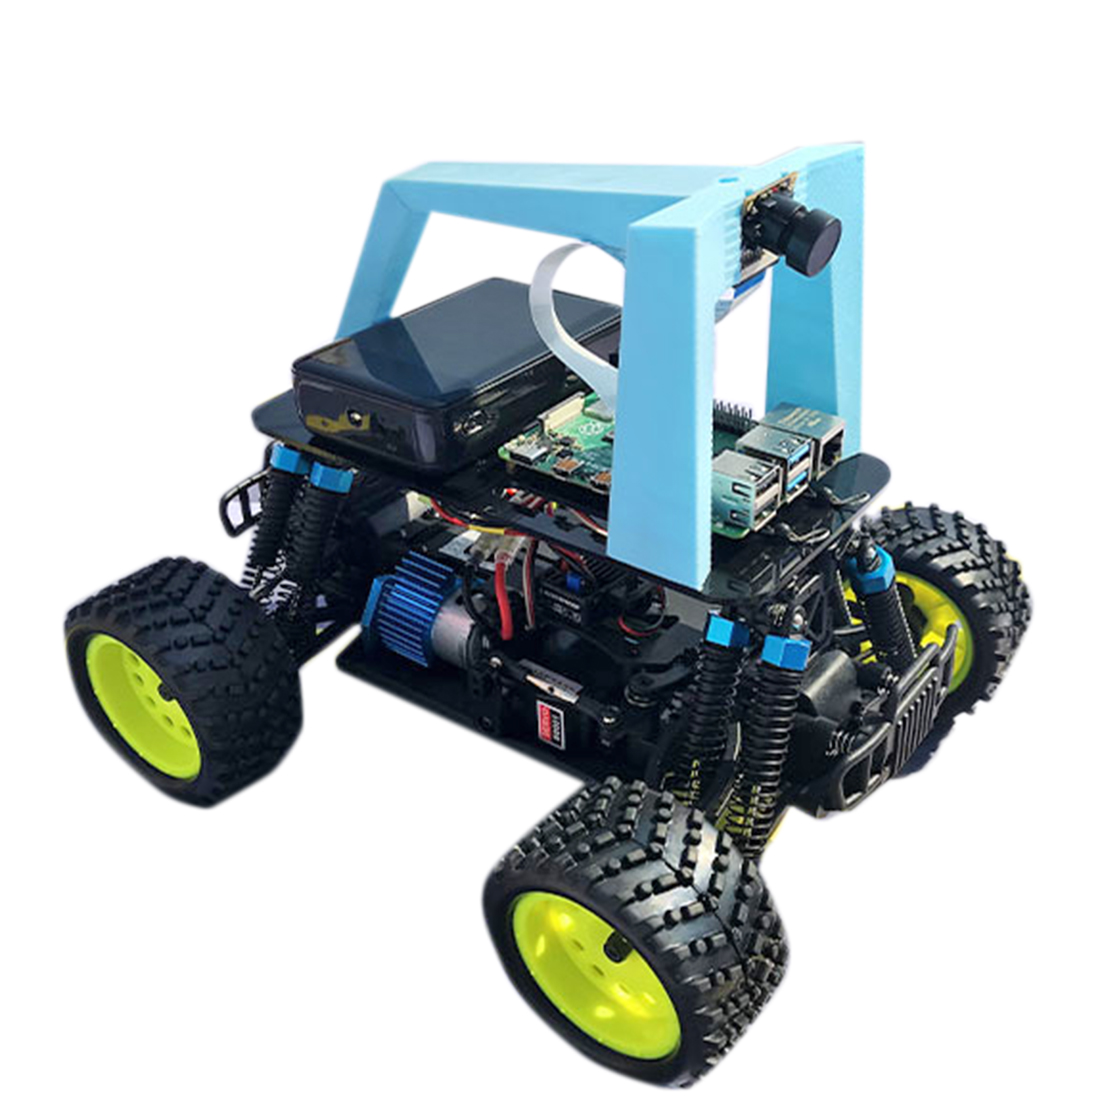 Hot Artificial Intelligence Car Programmable Autopilot Donkey Robot Car Kit With Racing Track For Jetson Nano Development Board